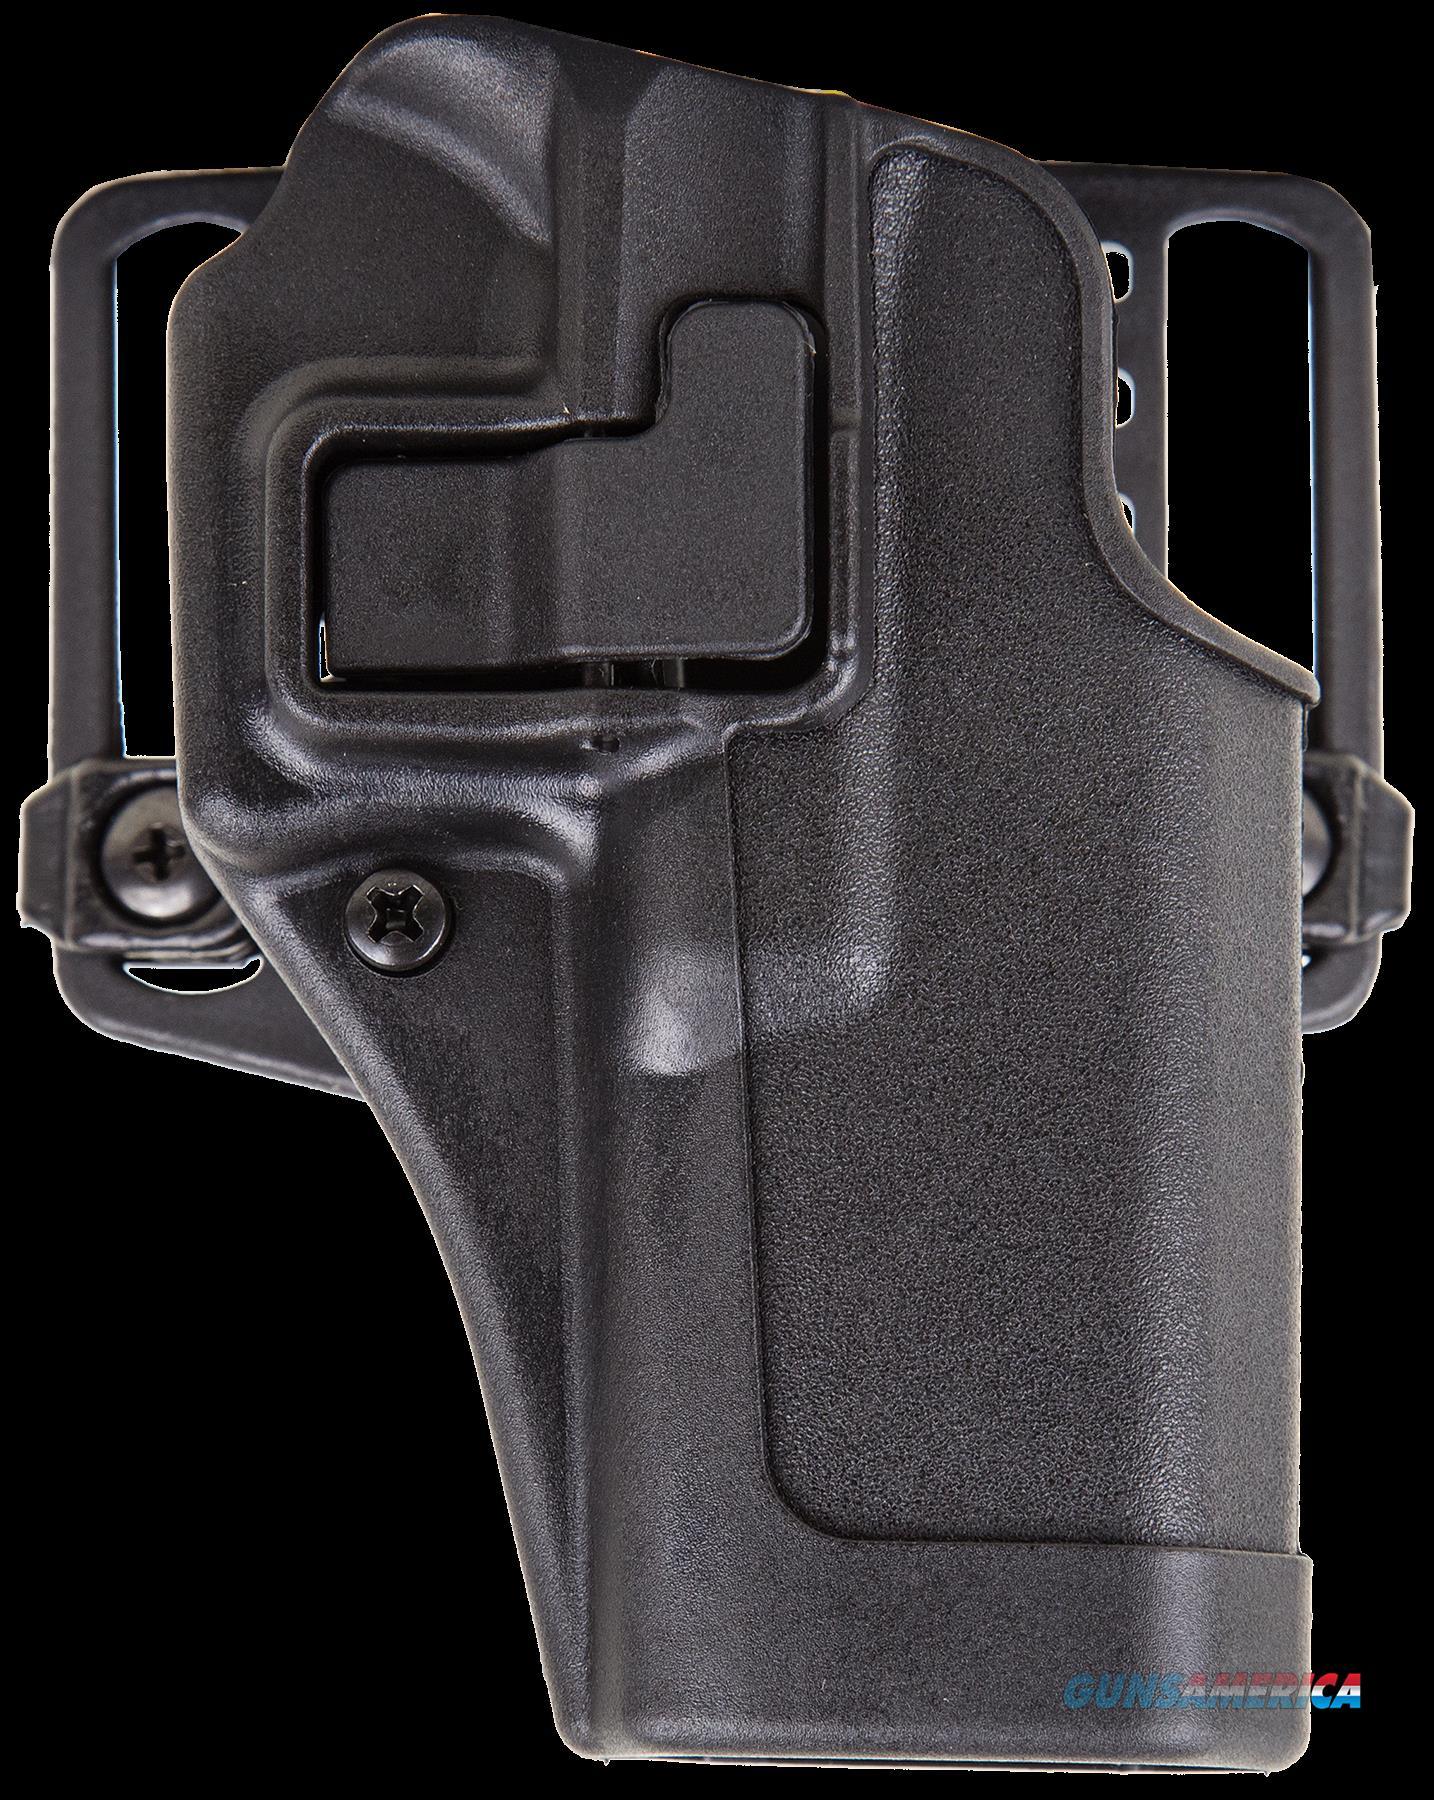 Blackhawk Serpa, Bhwk 410509bkl Serpa Cqc H&k Uspc  Guns > Pistols > 1911 Pistol Copies (non-Colt)